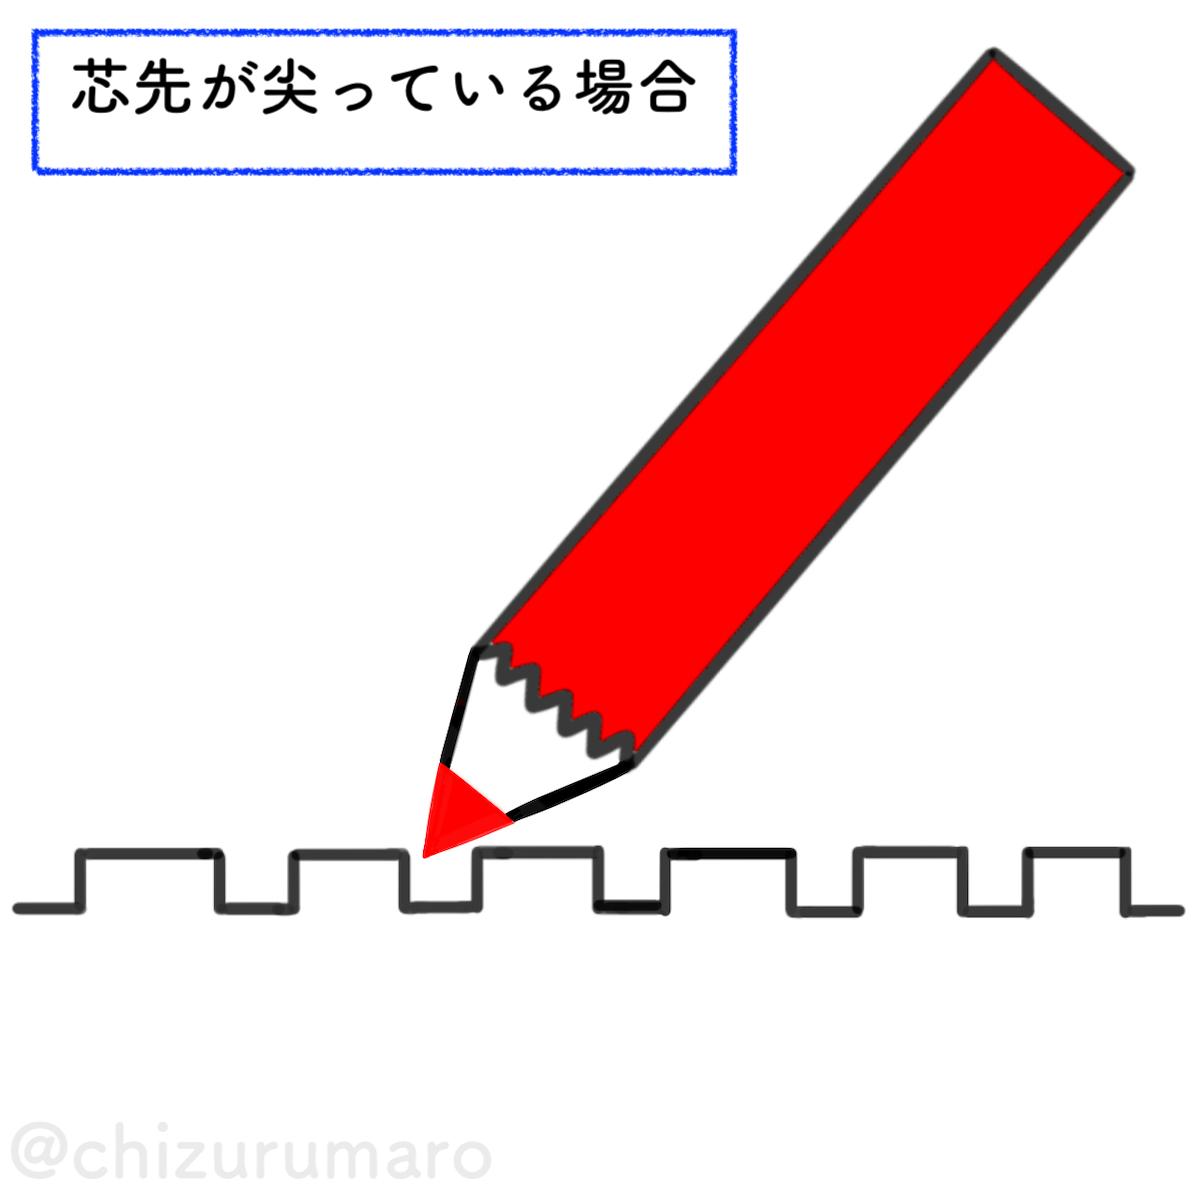 f:id:chizurumaro:20210828165143p:plain